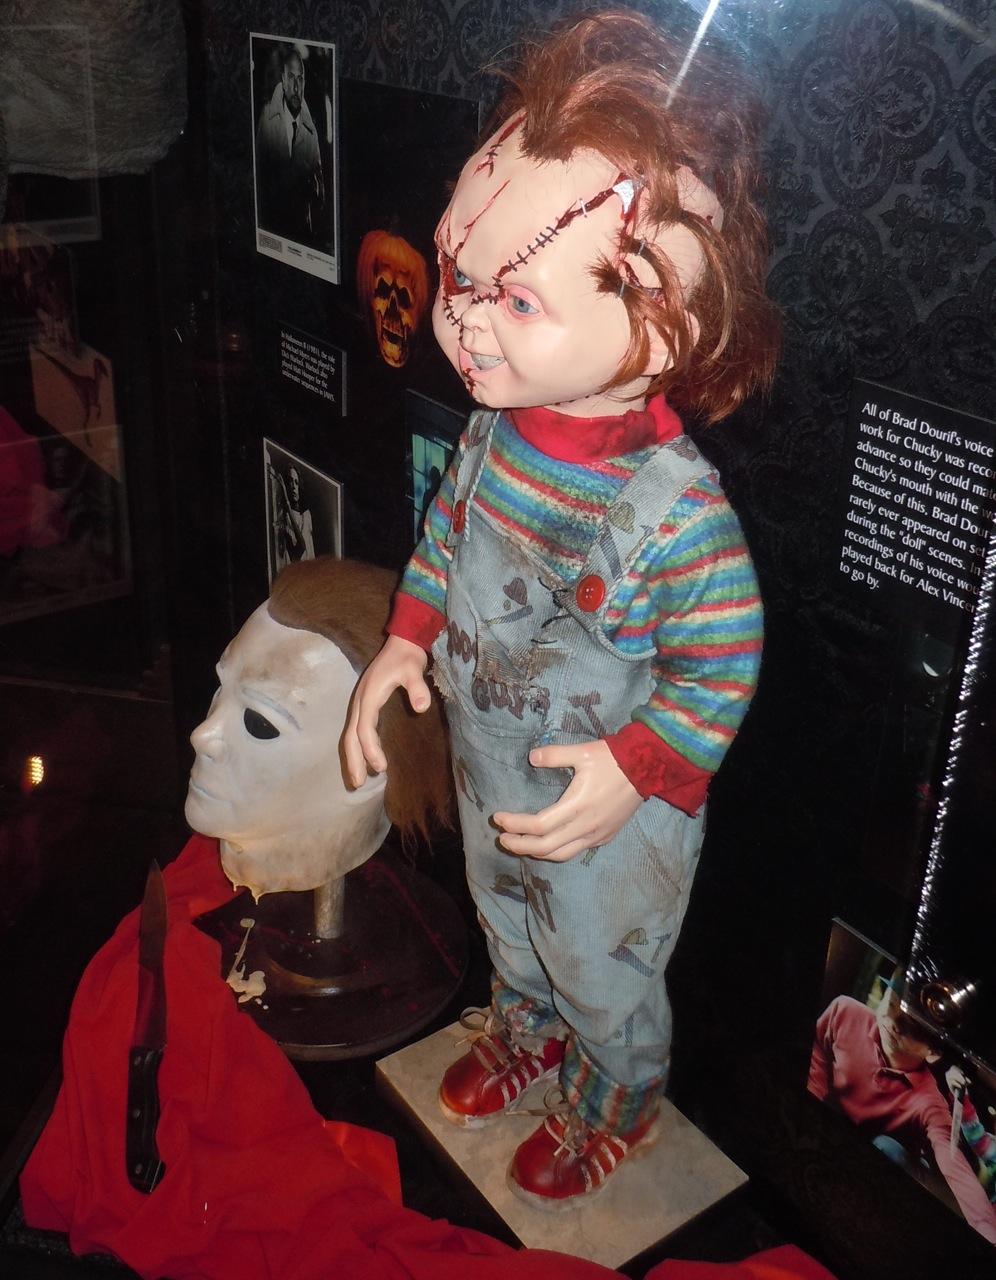 Horror Puppe Chucky